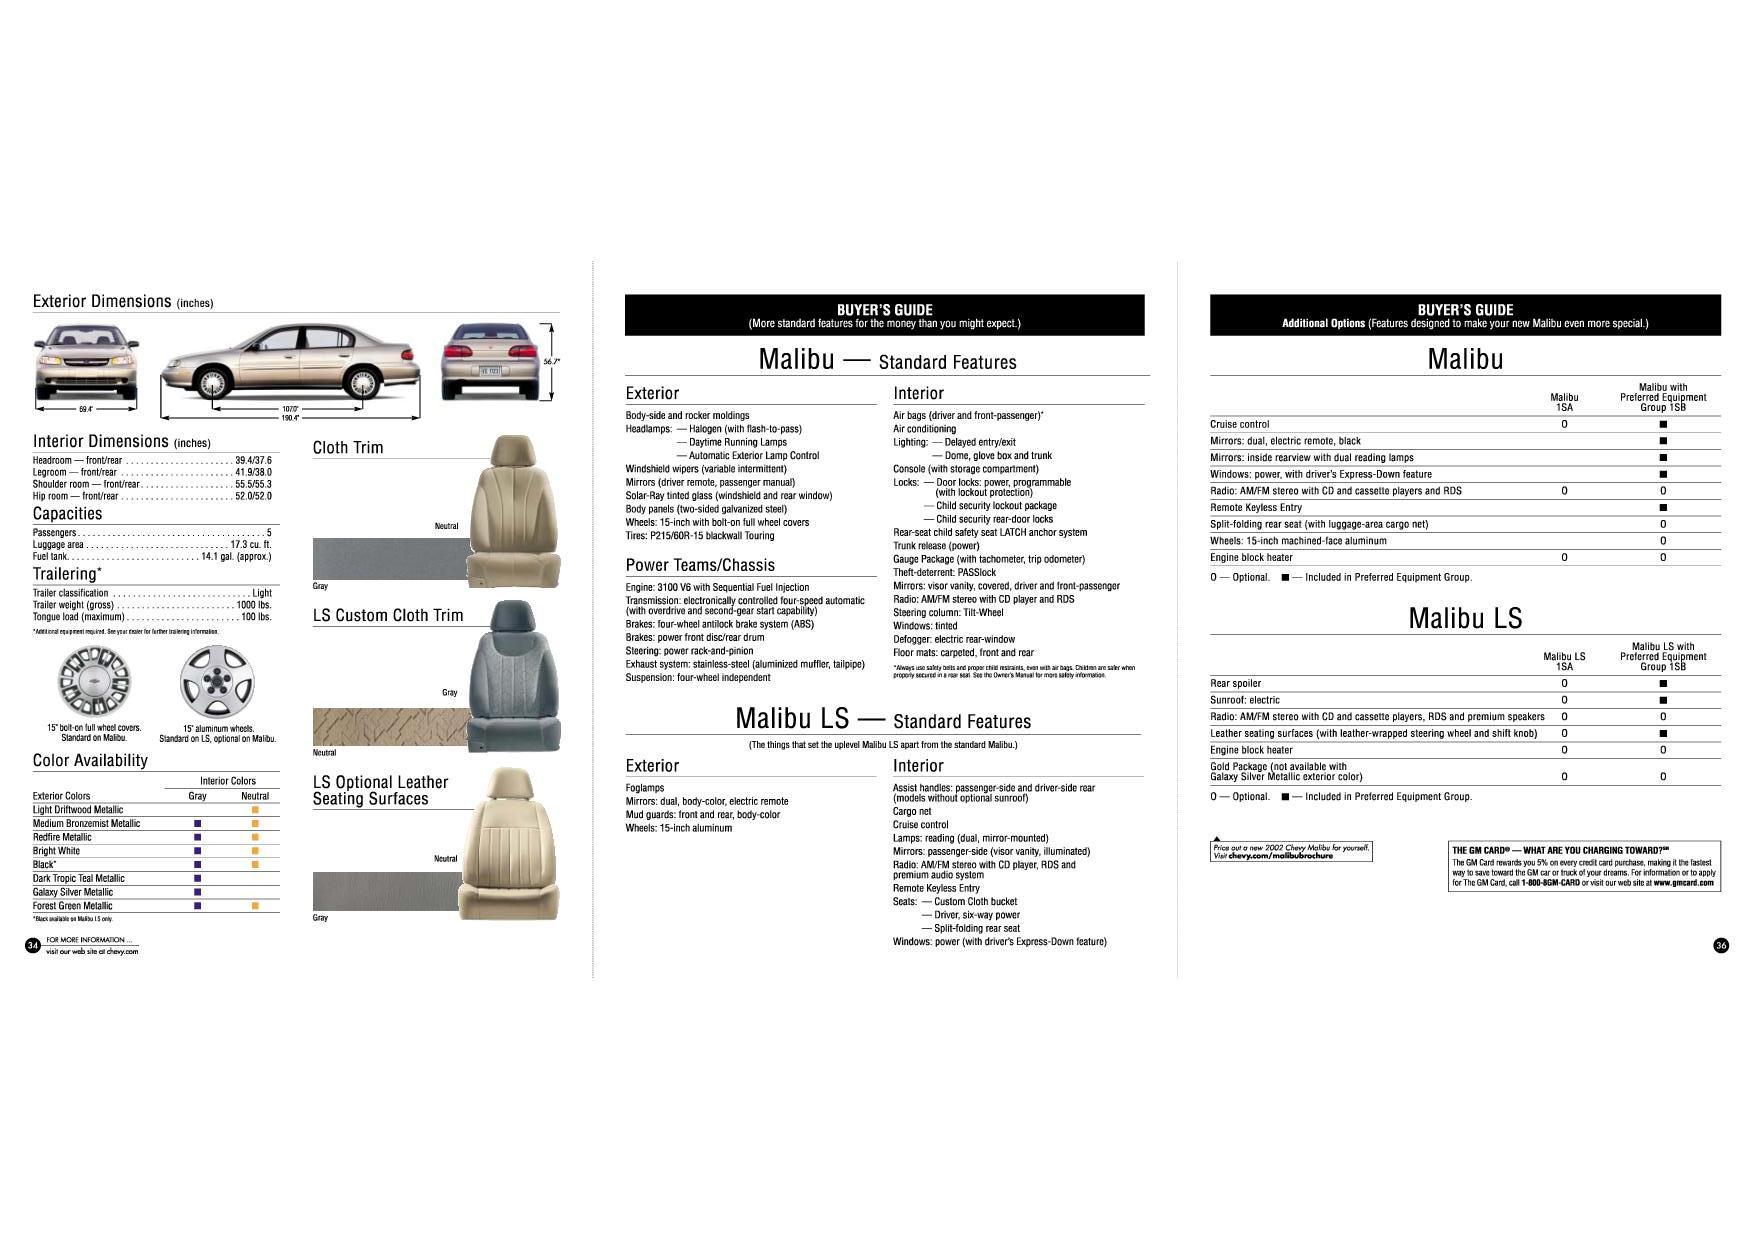 2002 Chevrolet Malibu brochure